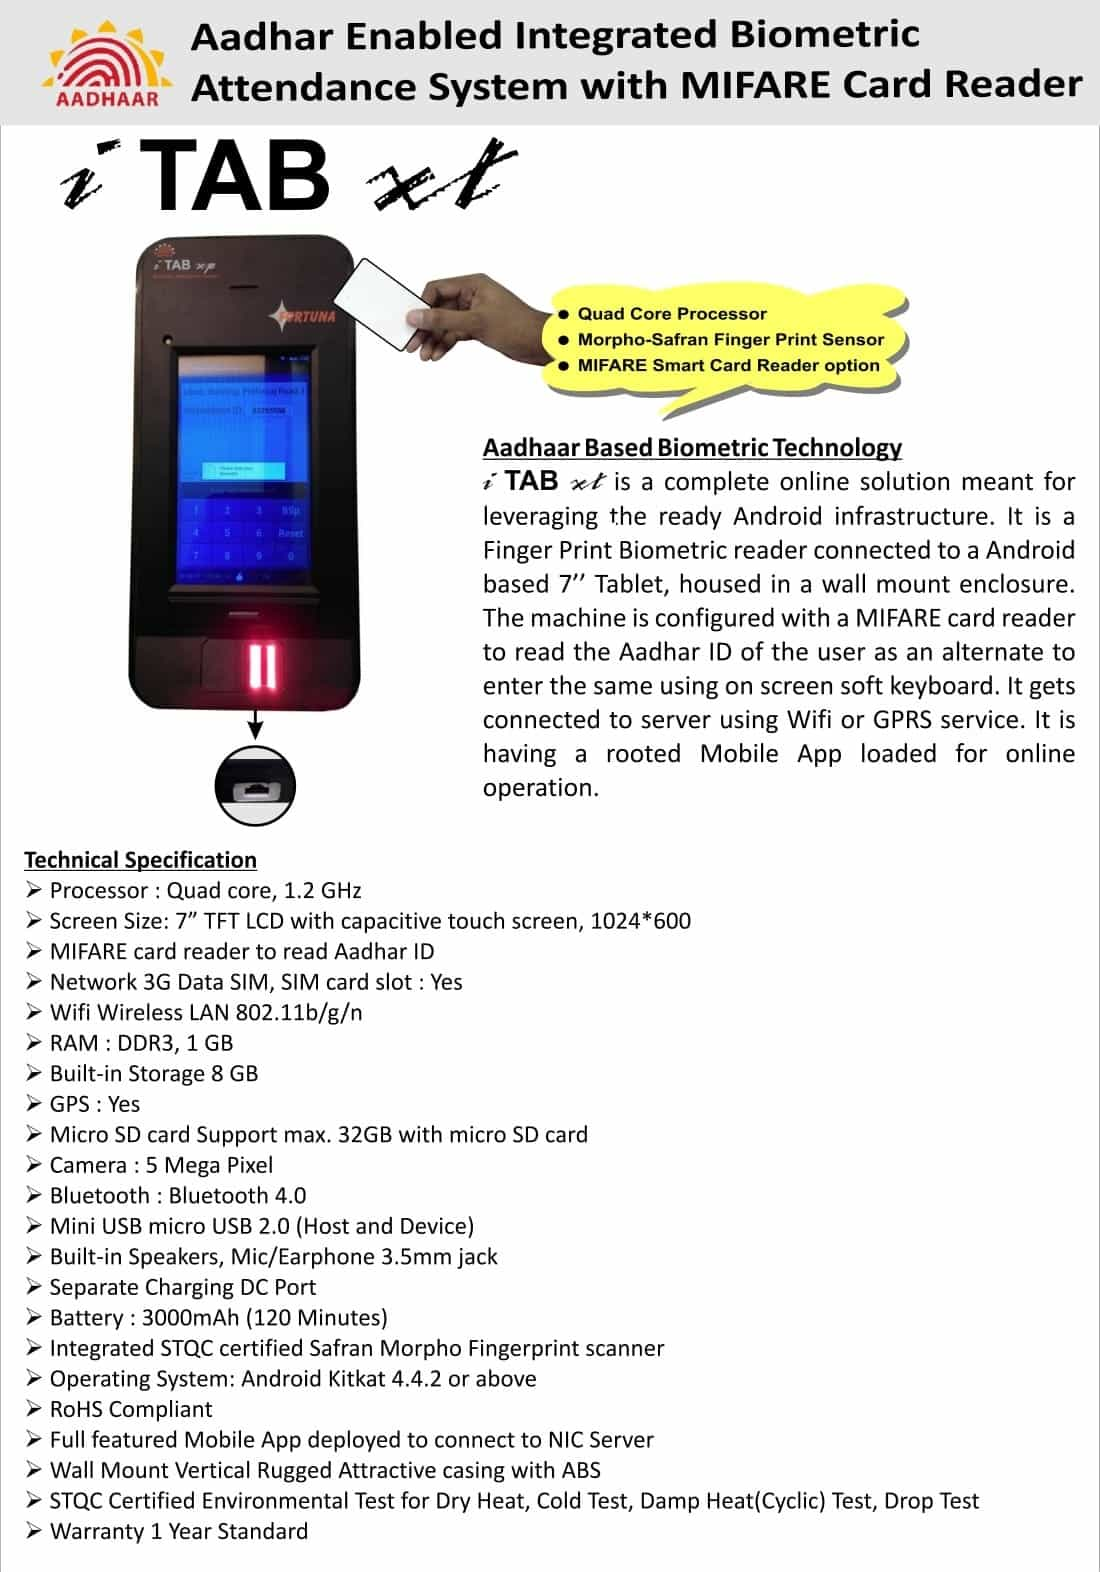 Aadhaar based Biometric Attendance System i TAB xt Catalog